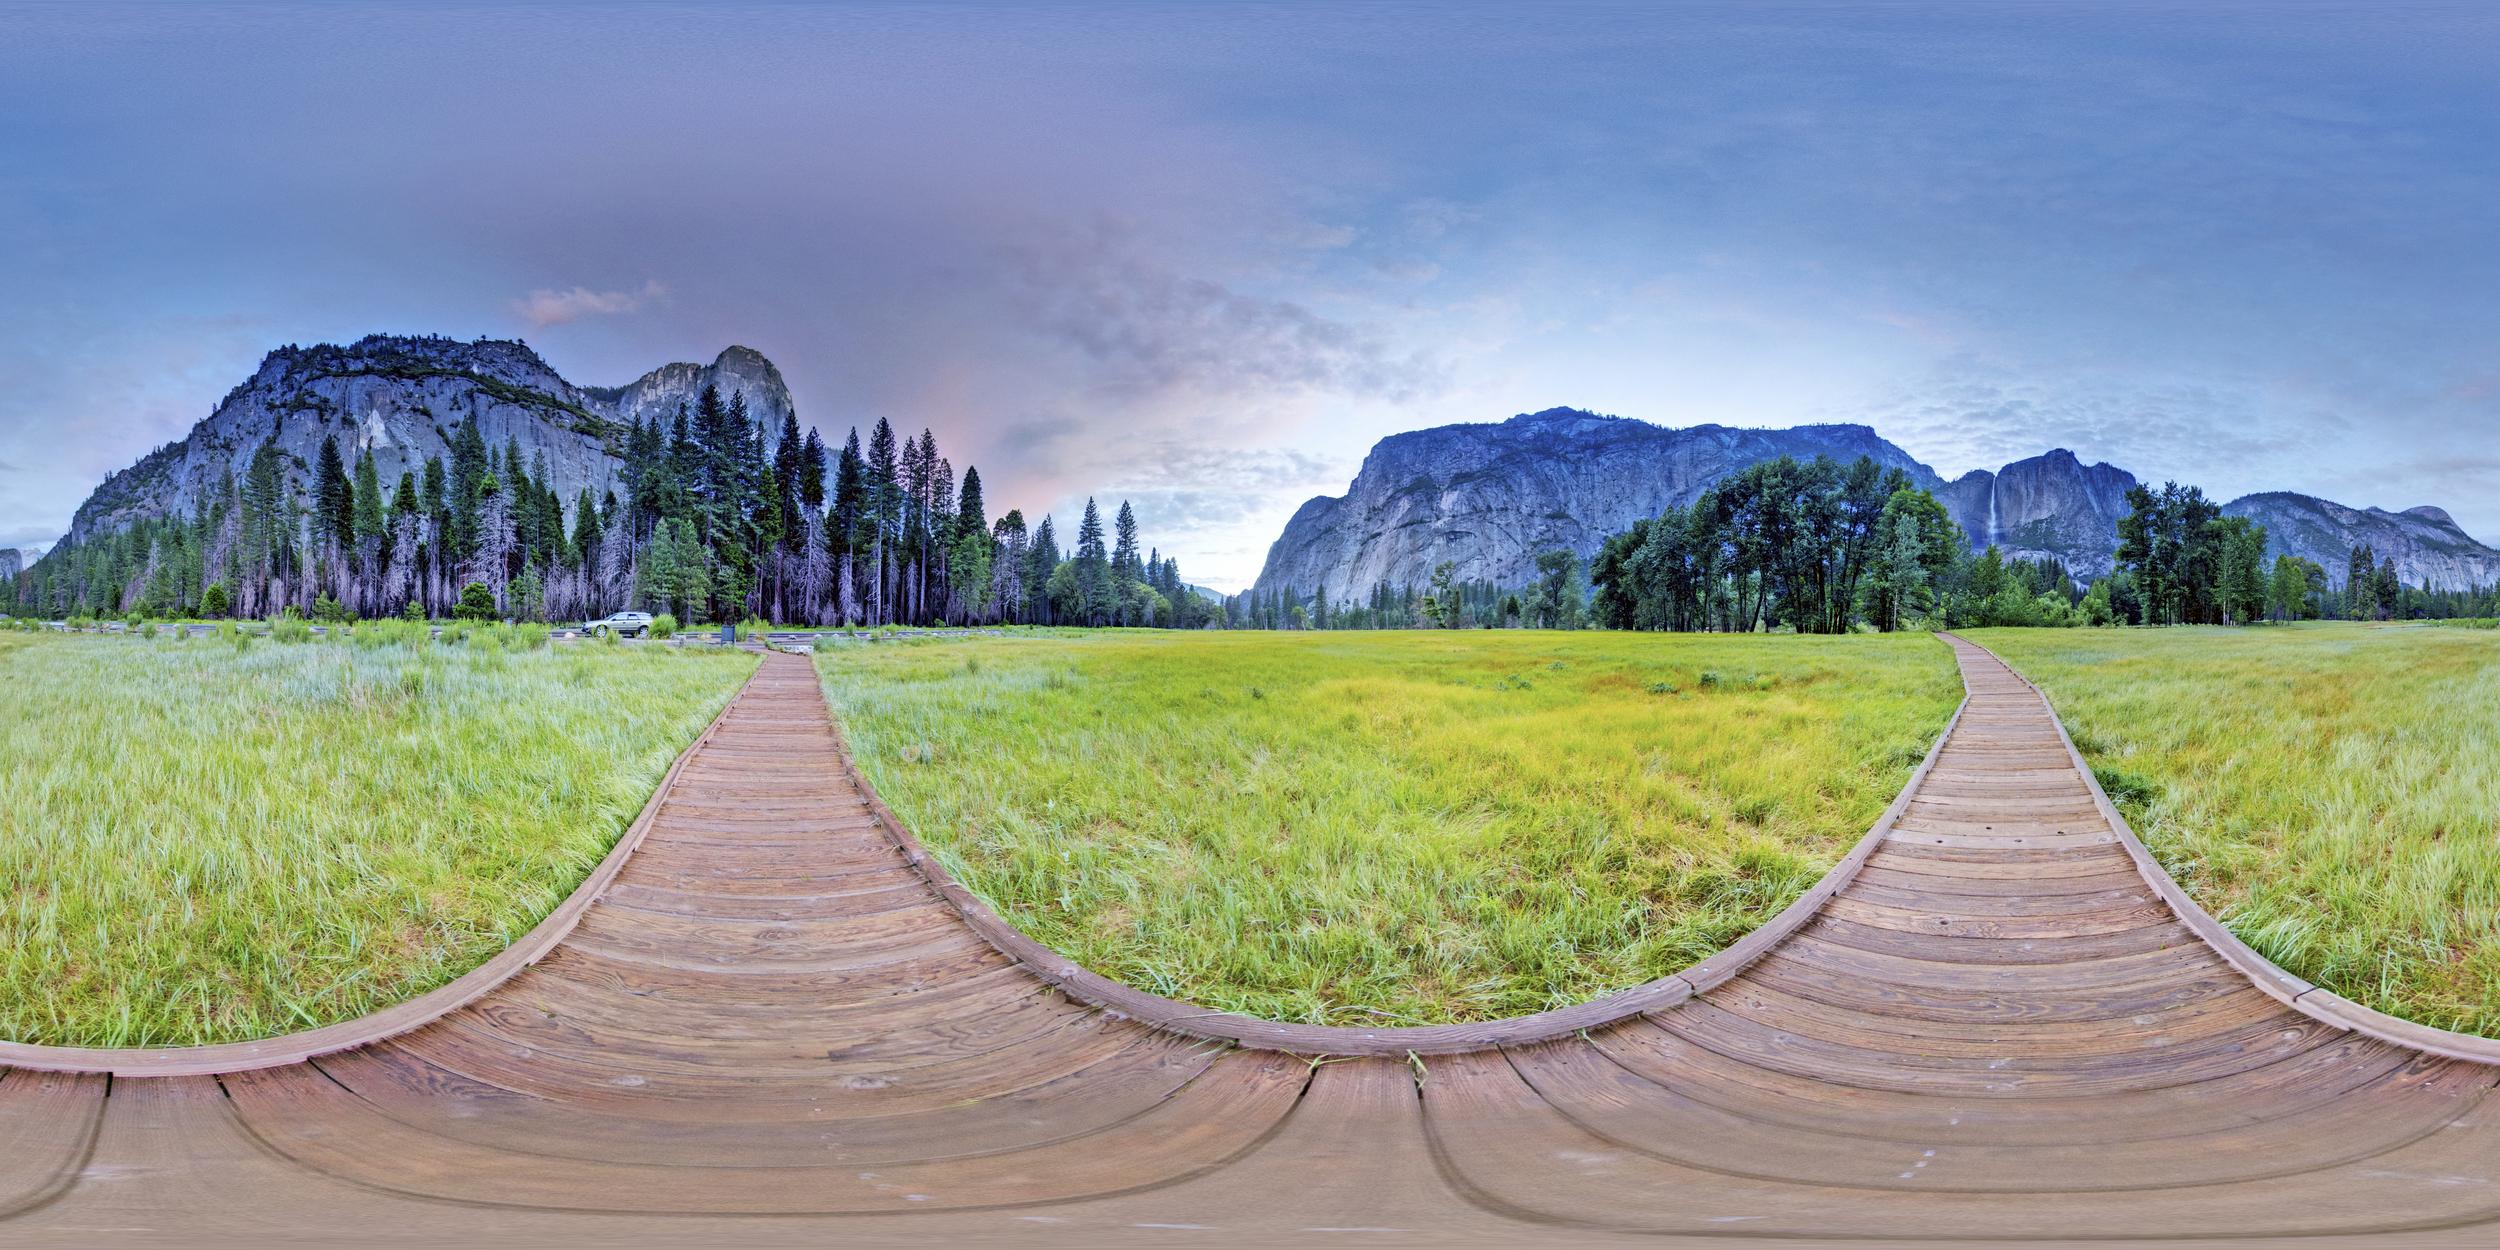 360º Landscape; View of El Capitan Meadow at Yosemite National Park.